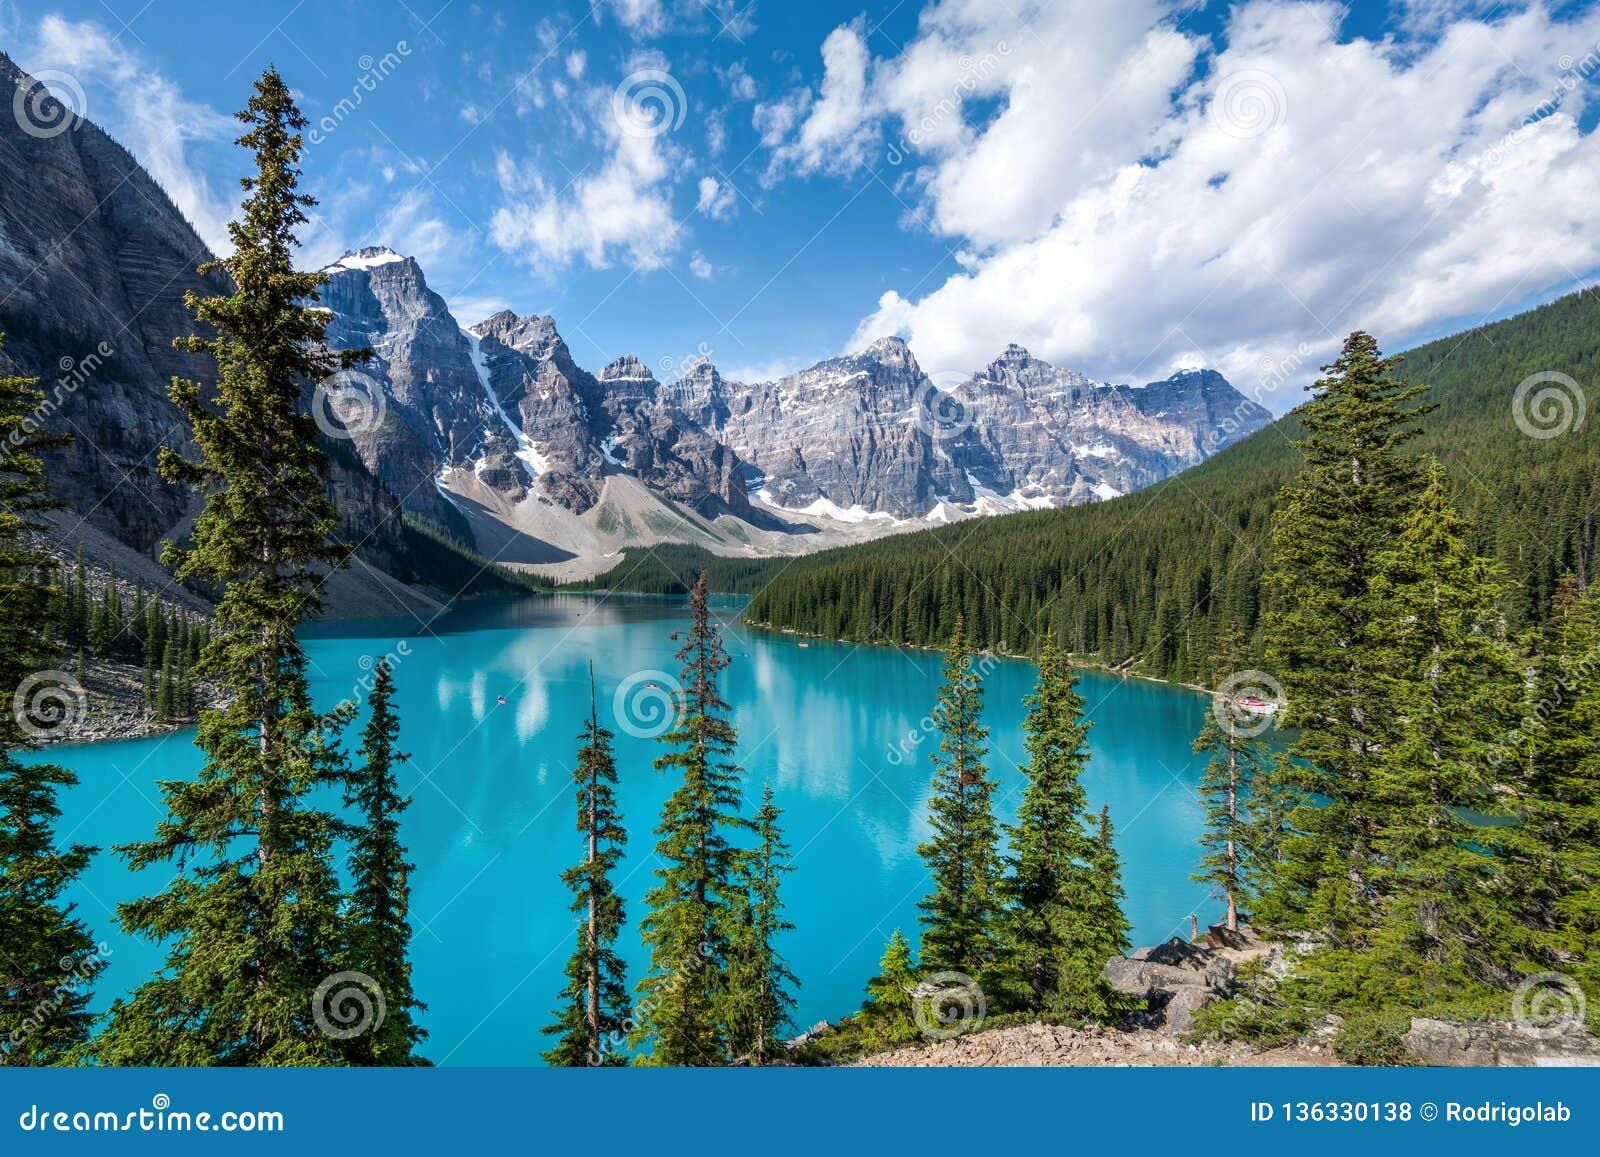 Moraine See in Nationalpark Banffs, Kanadier Rocky Mountains, Alberta, Kanada